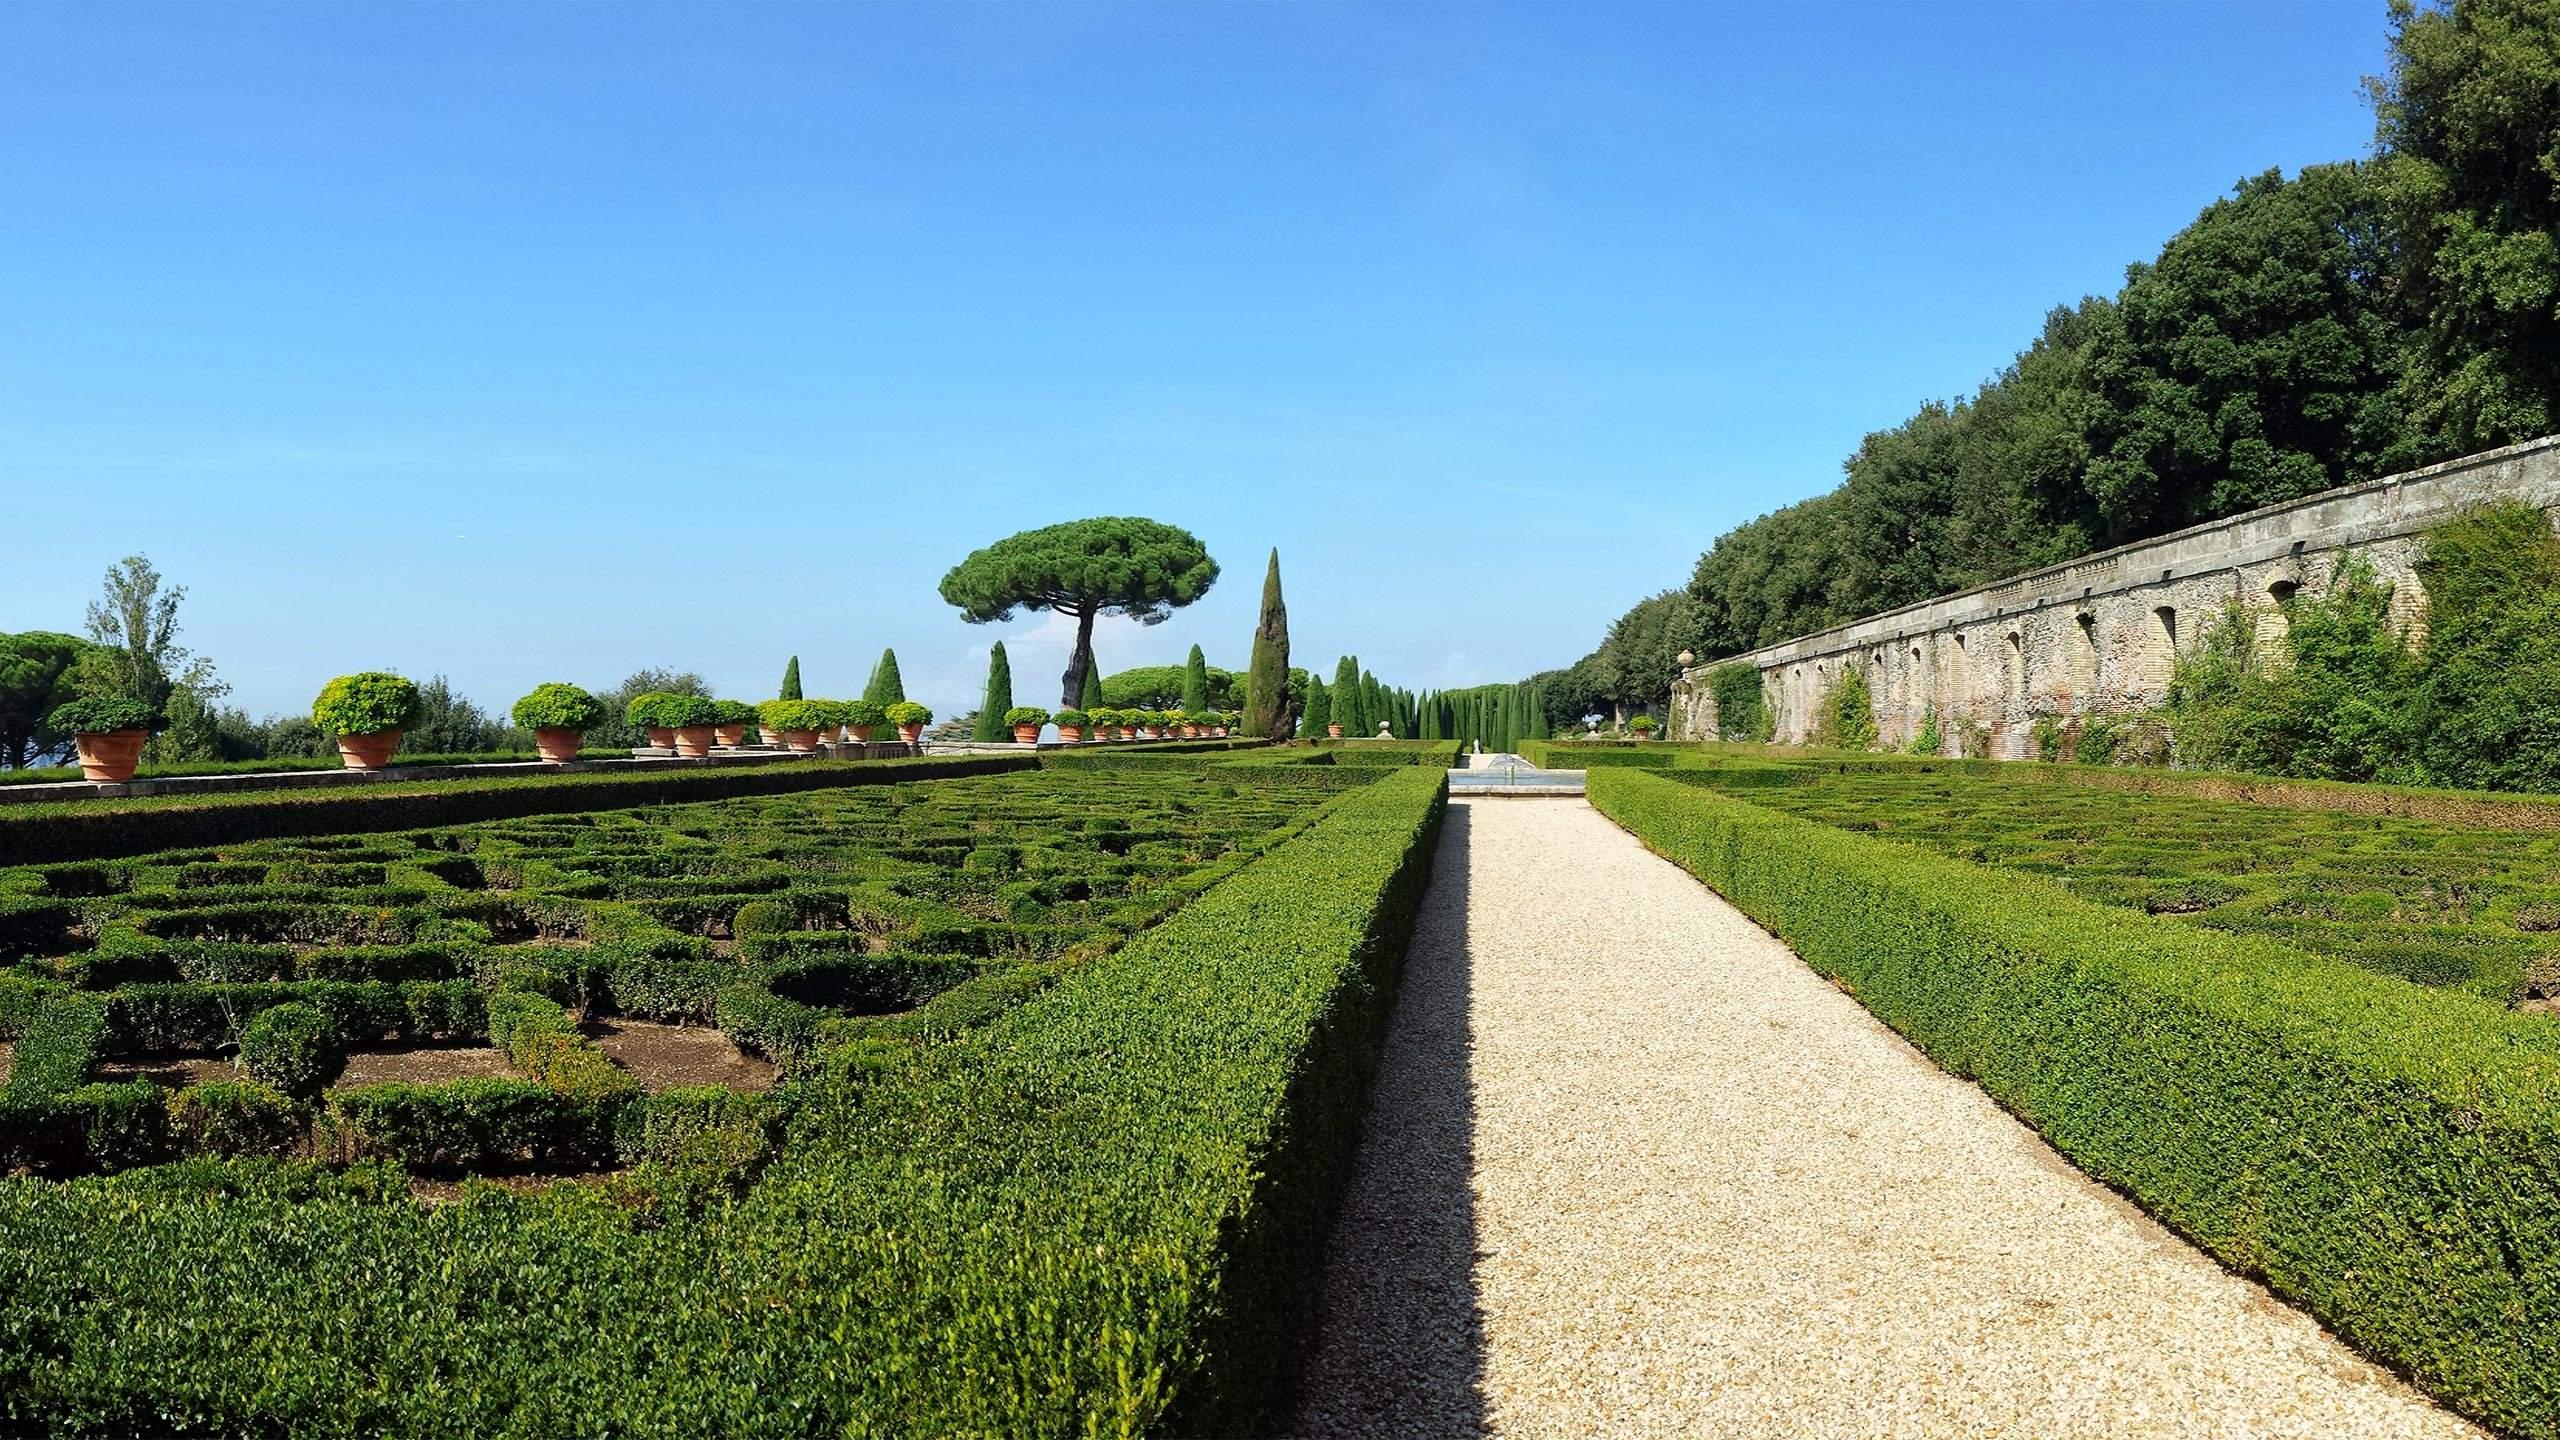 Hotel-Colonna-Frascati-castel-gandolfo